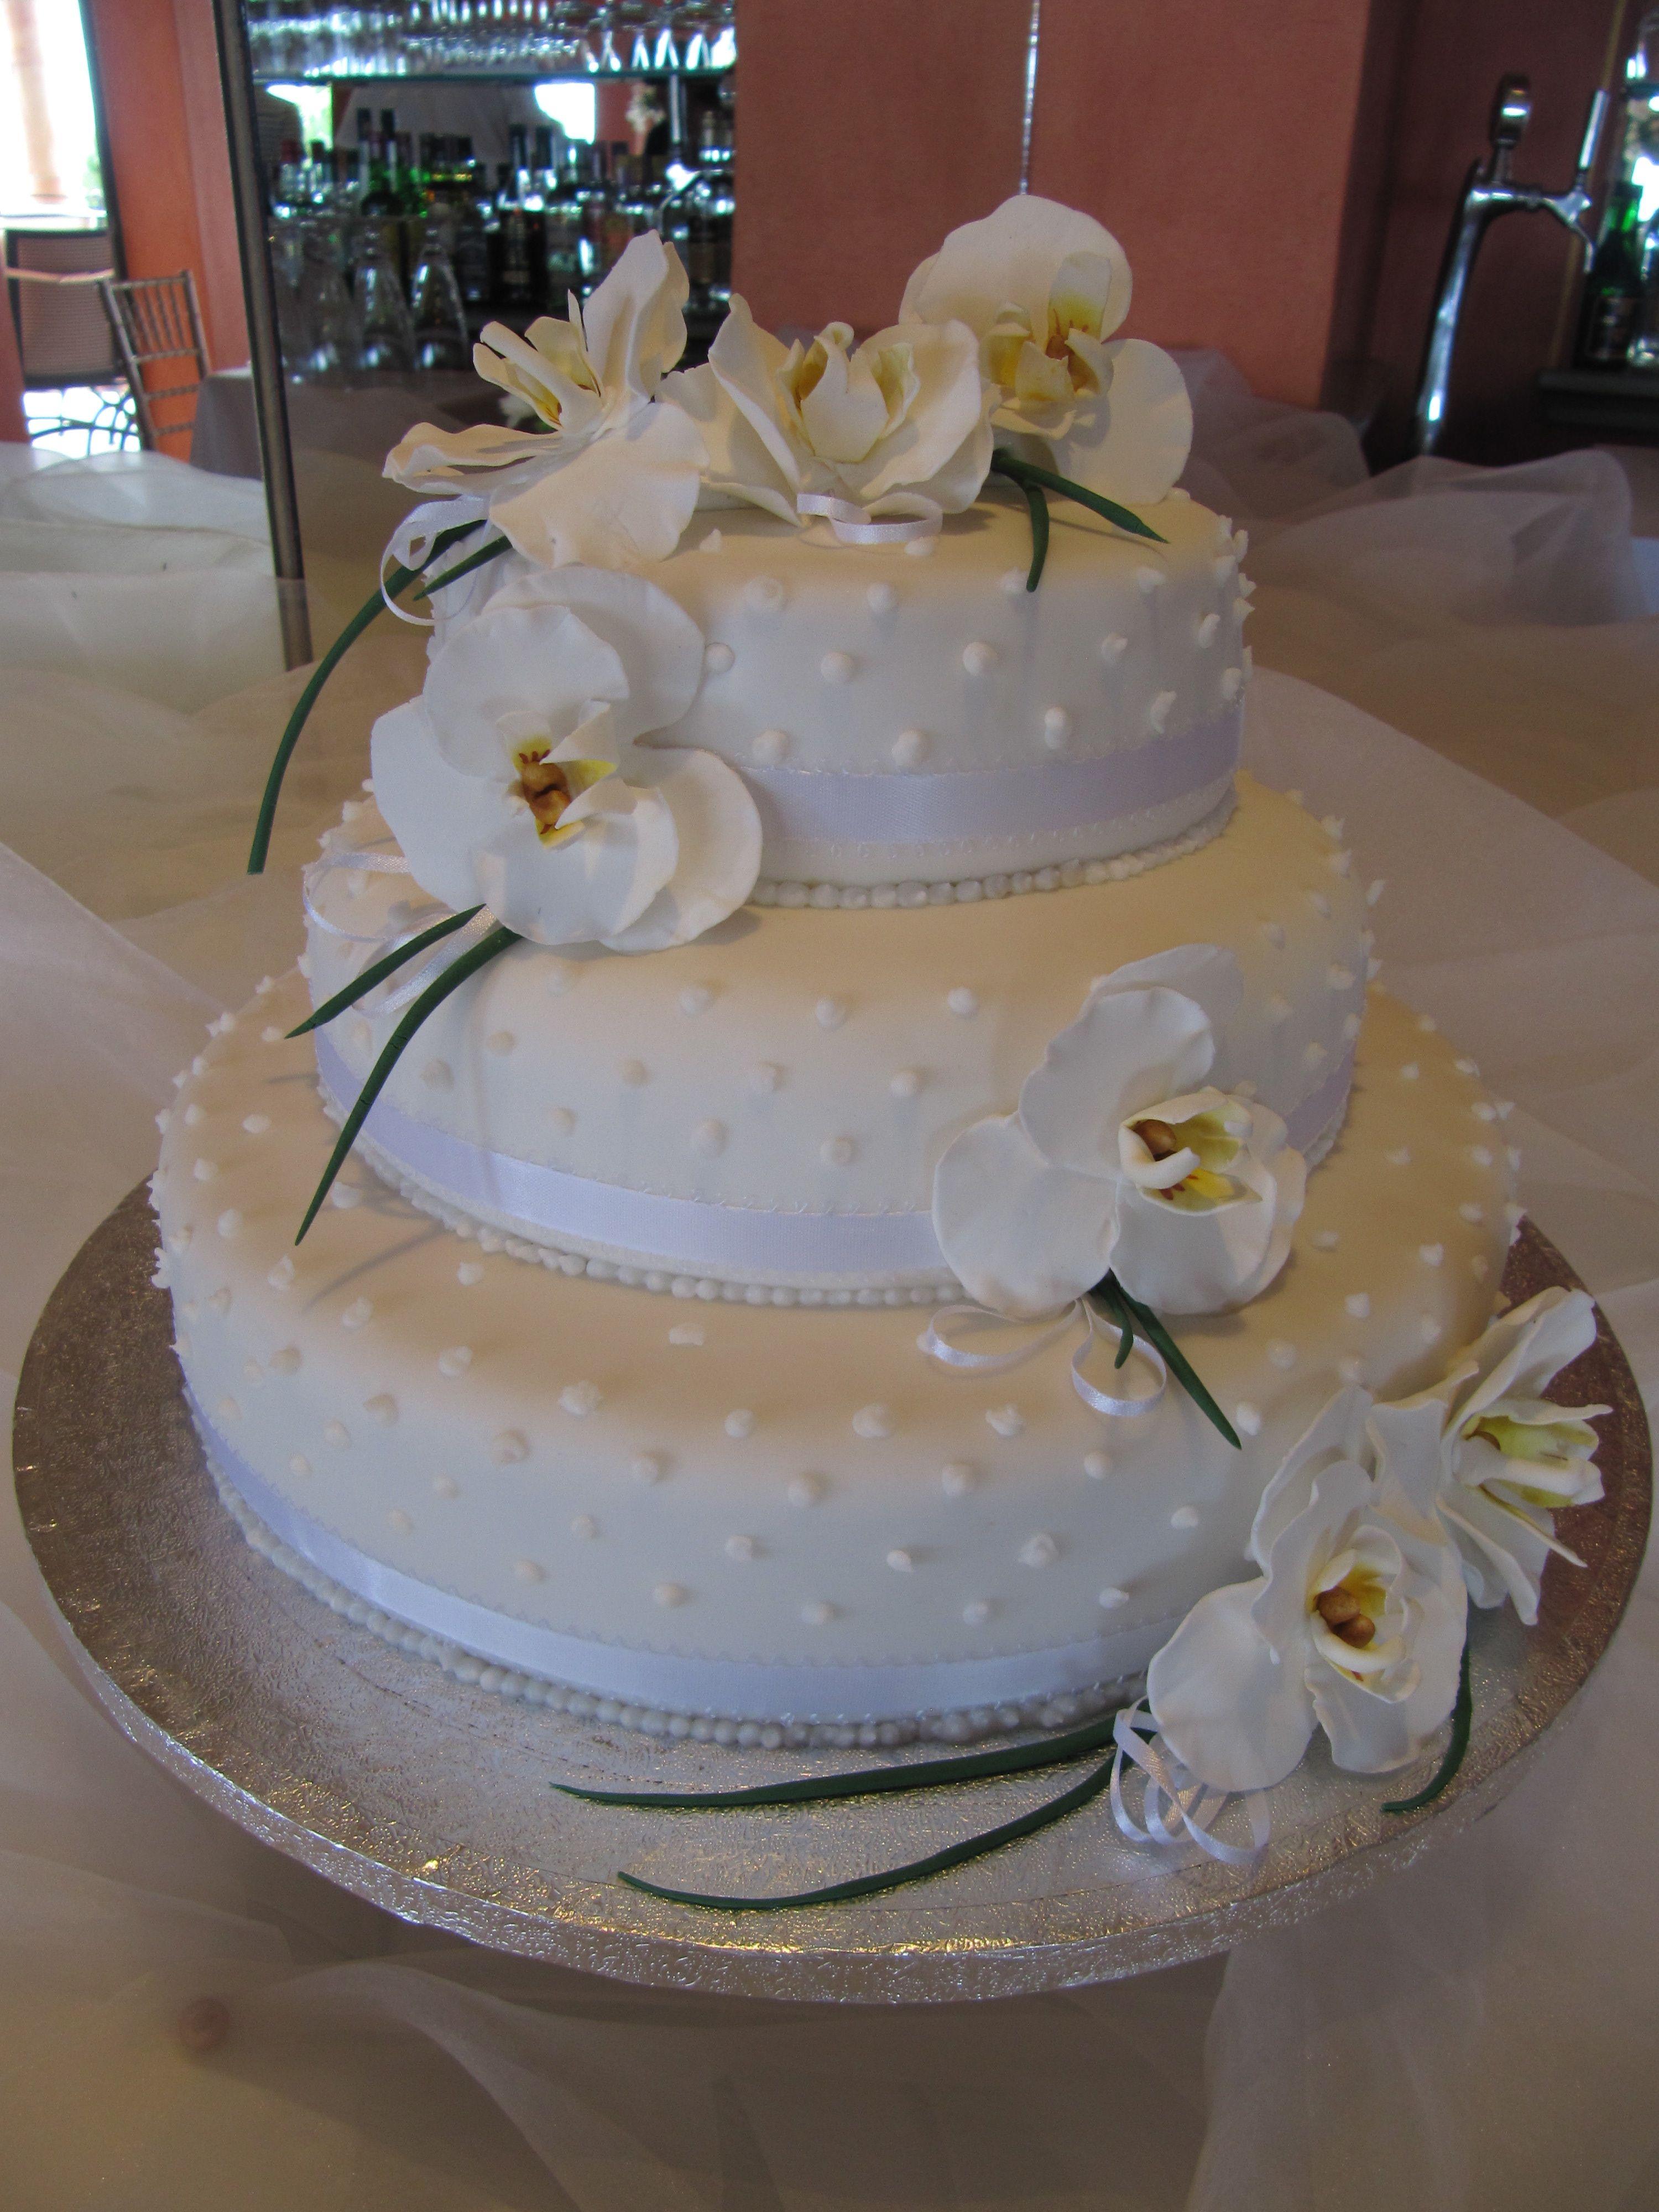 ©Algarve cakes. 3 tier wedding cake with handmade phalaenopsis orchids.